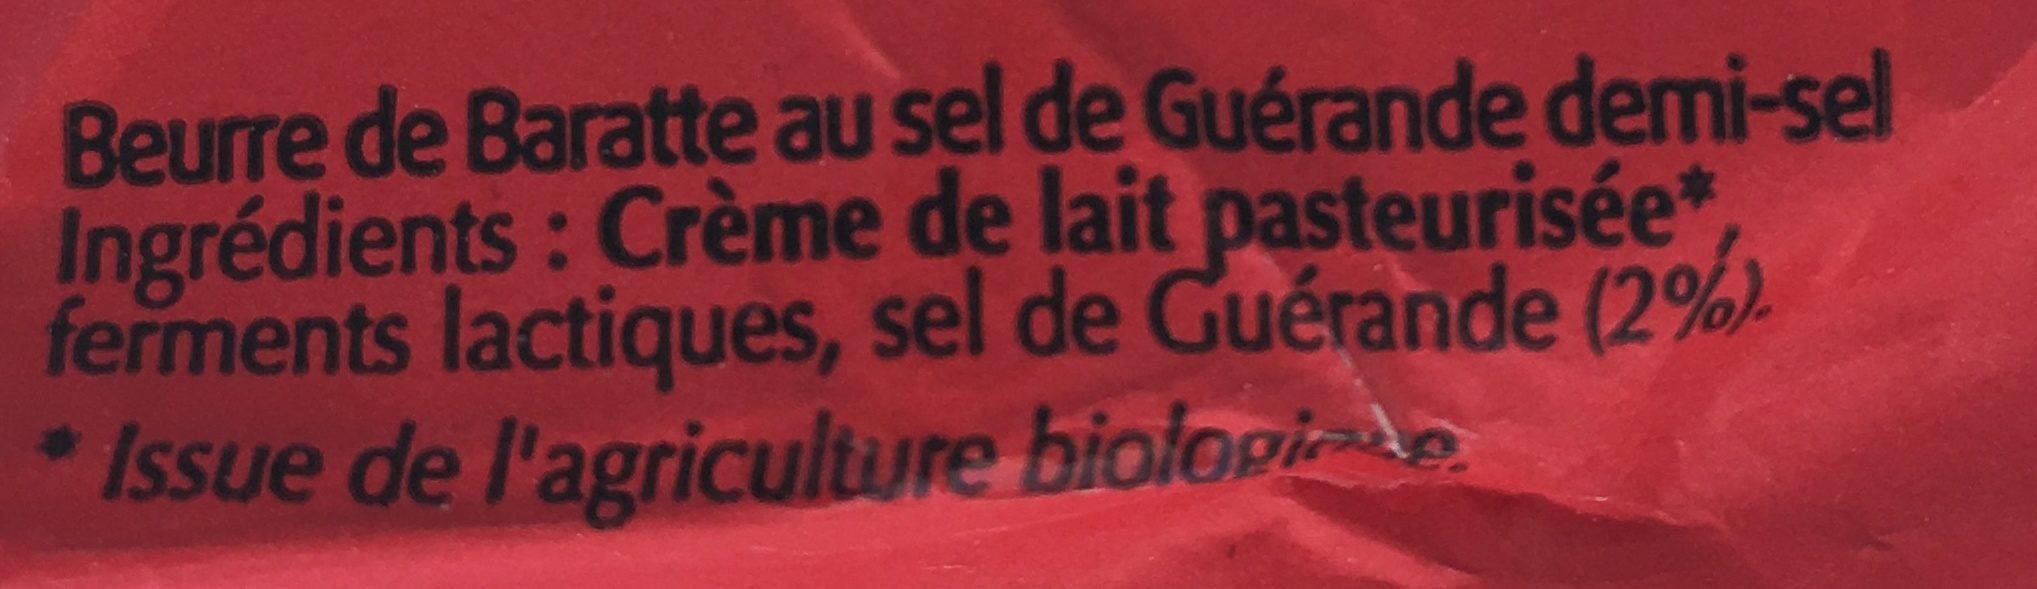 Beurre de Baratte Demi Sel - Ingrédients - fr